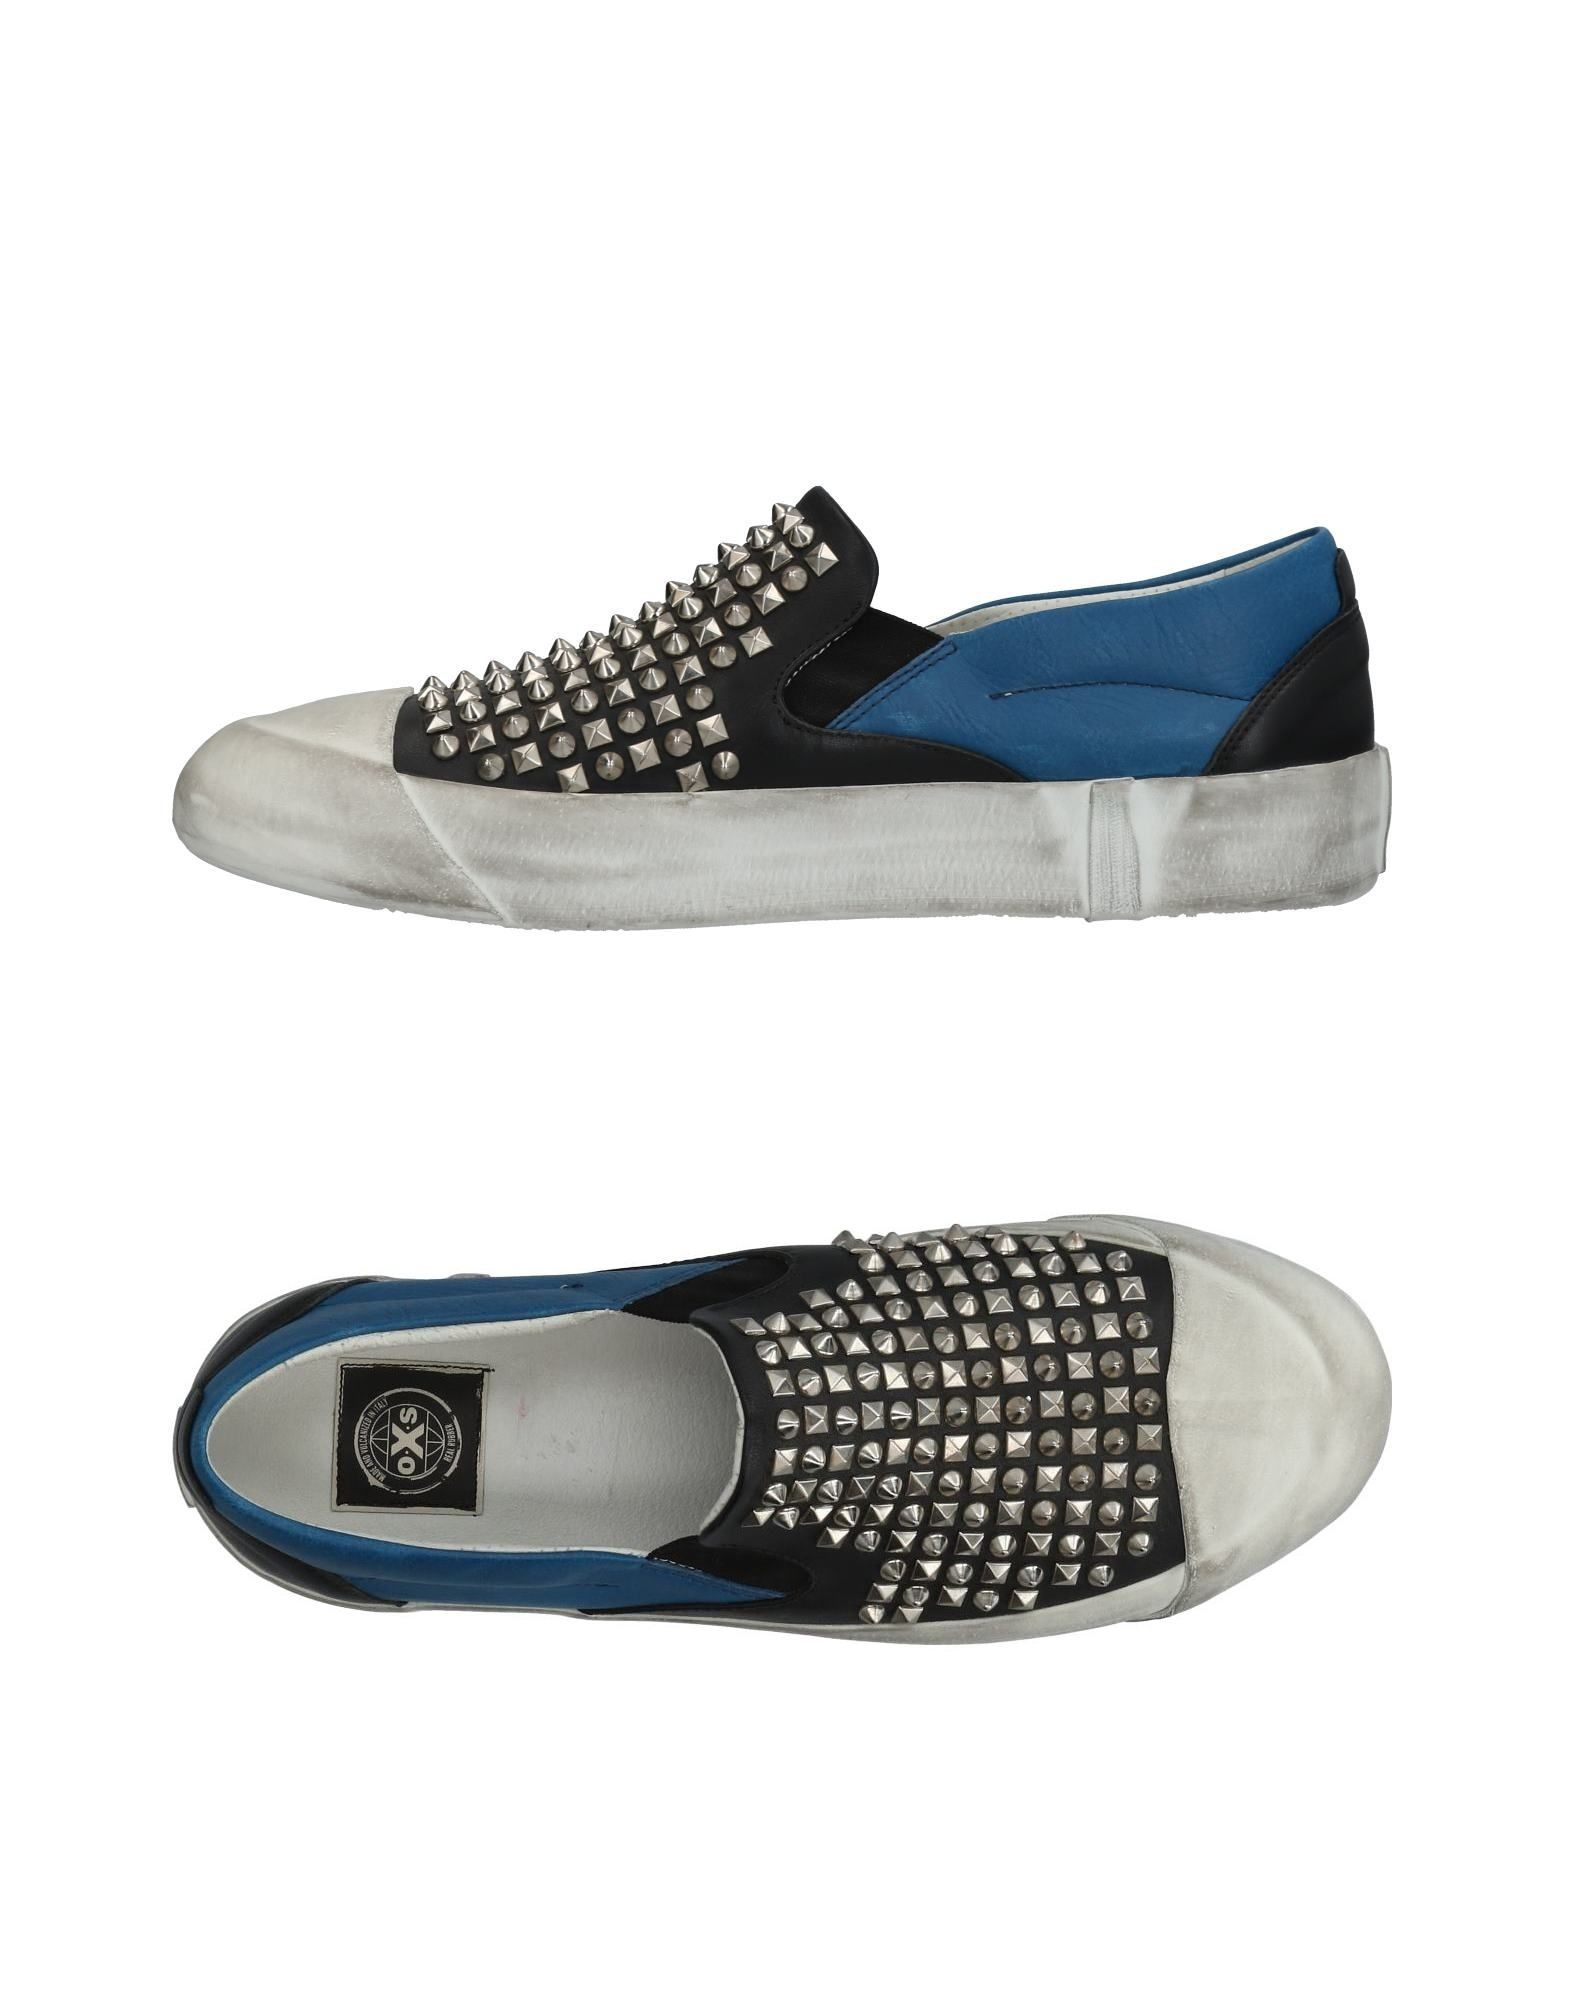 Moda Sneakers O.X.S. Uomo Uomo O.X.S. - 11455771UL c9623a